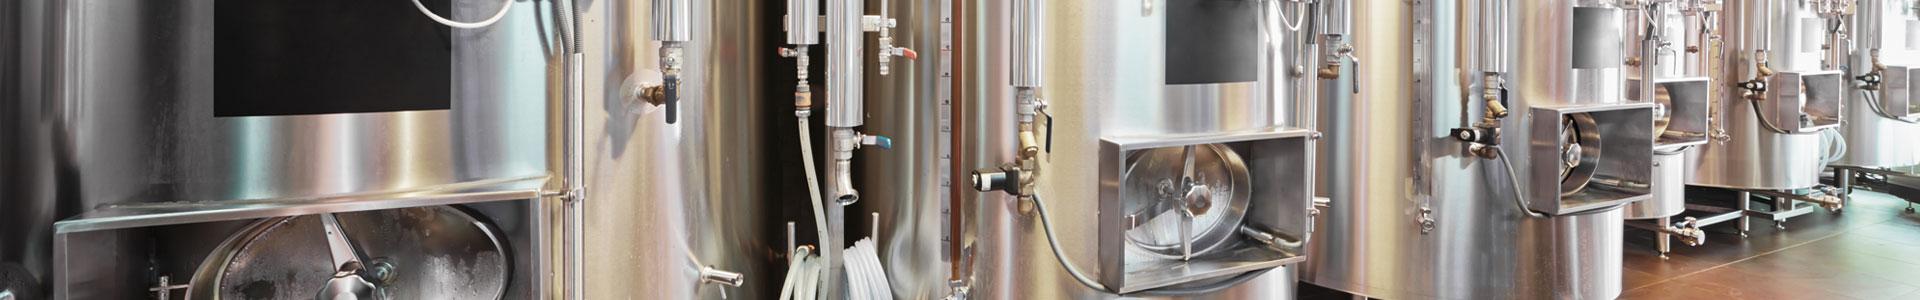 Food Grade Equipment & Beverage Tanks